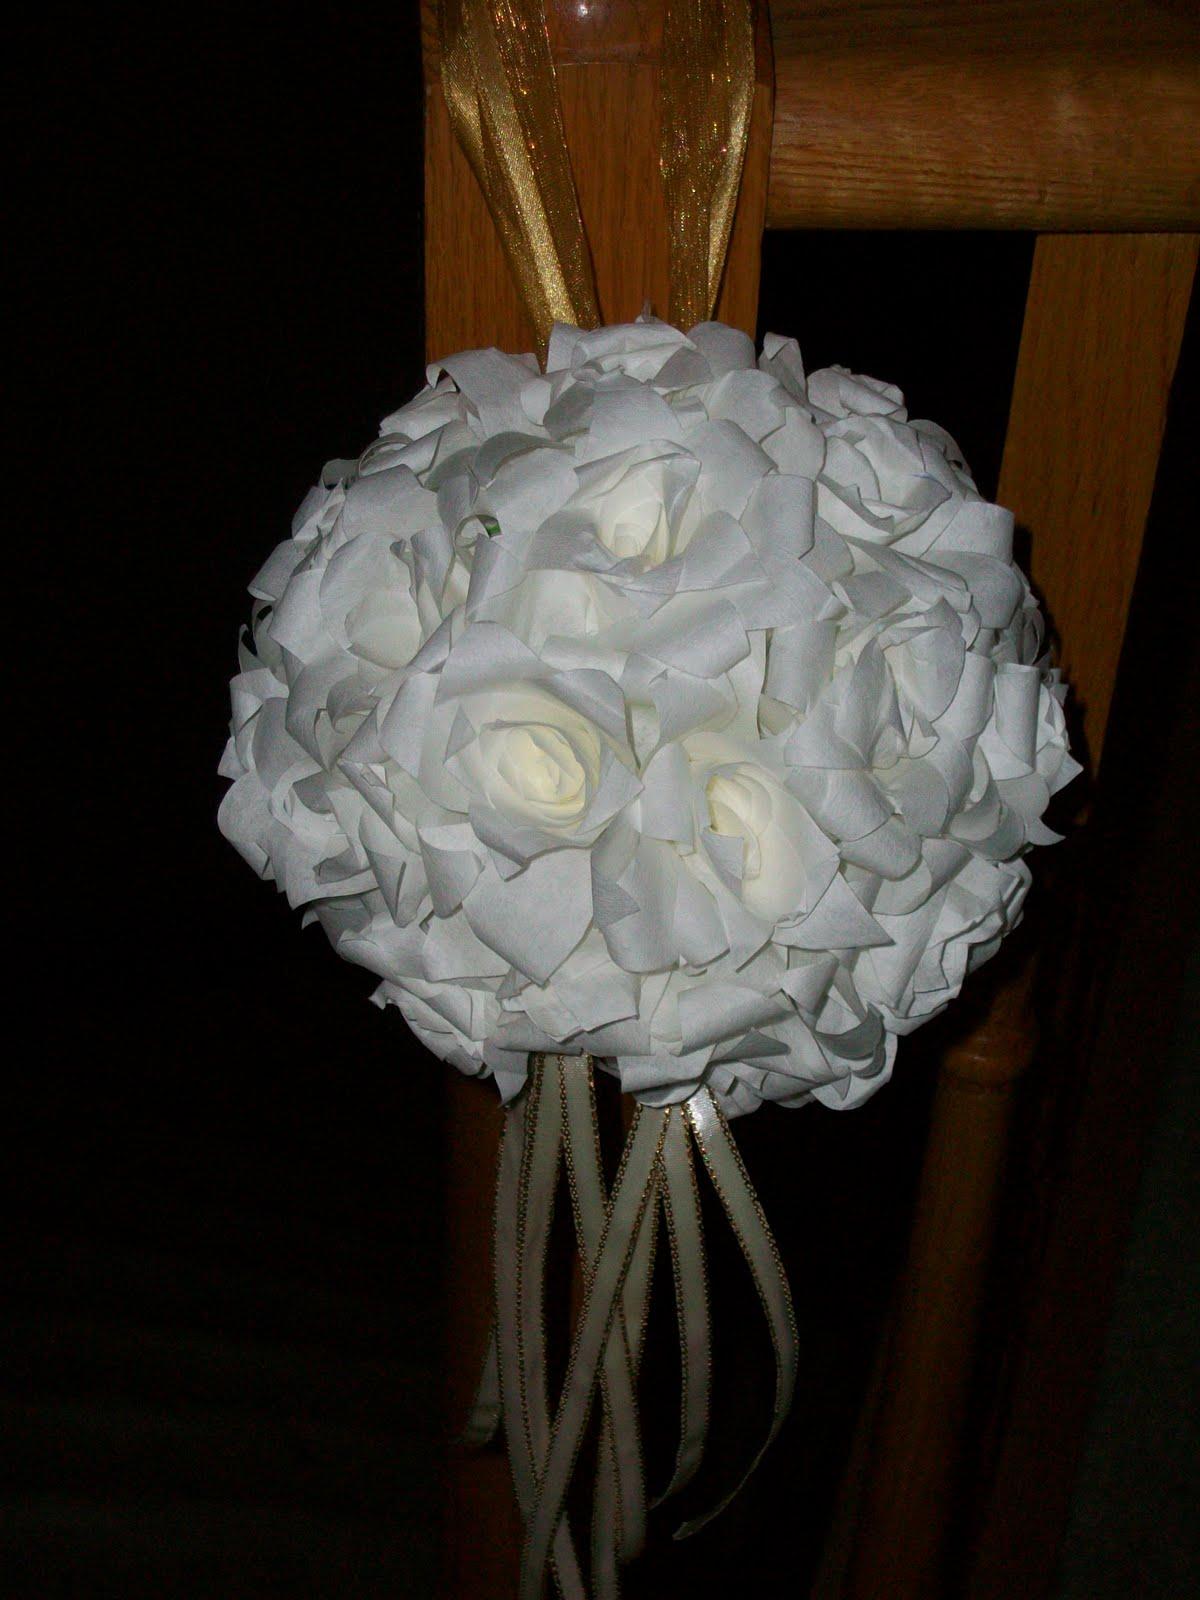 Paper Roses Diy 4 Pomander Kissing Ball Wedding Flowers Made Easy